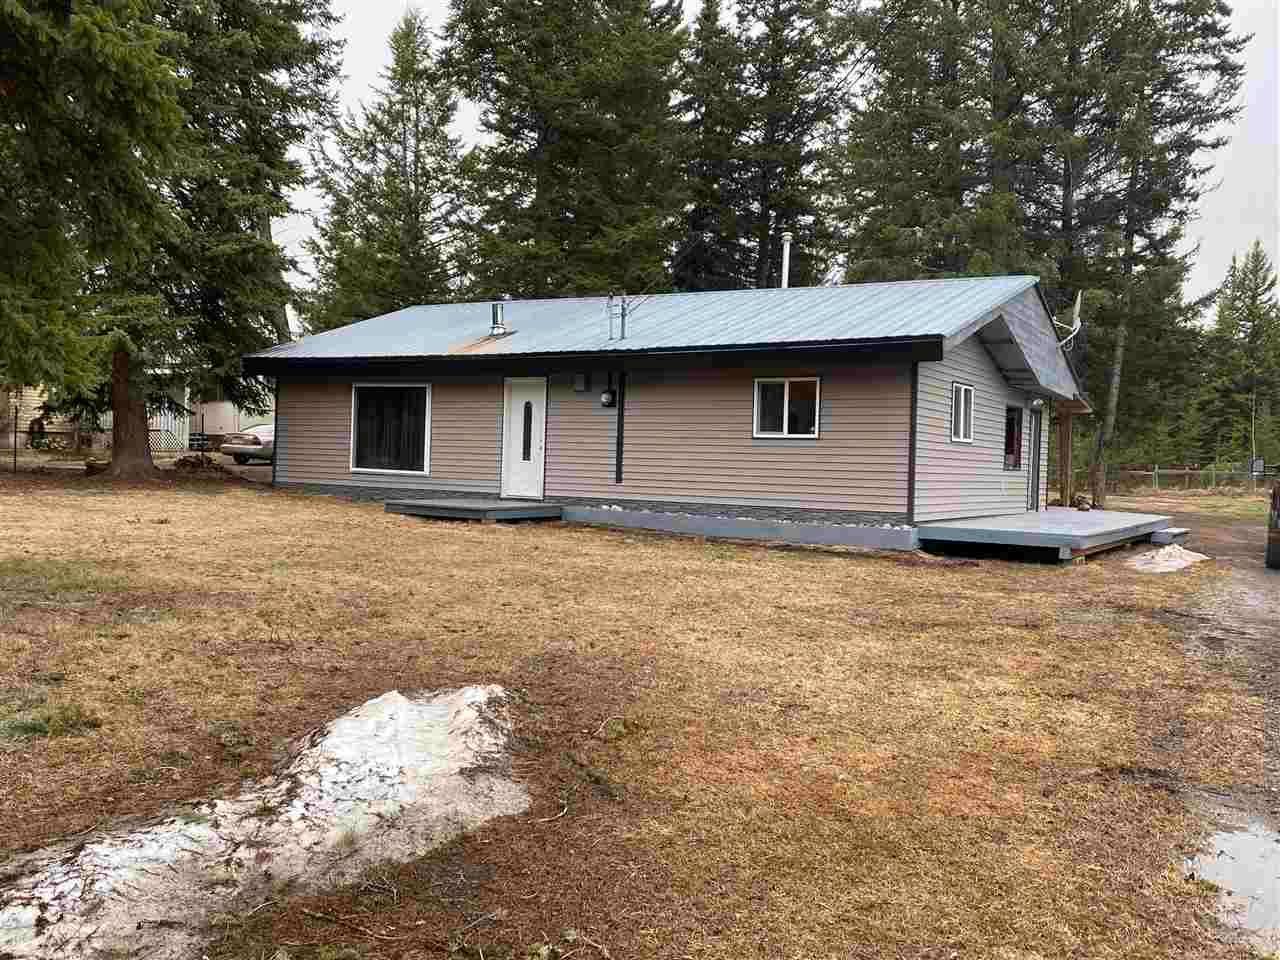 Main Photo: 4165 PACIFIC Road in Williams Lake: Williams Lake - Rural North House for sale (Williams Lake (Zone 27))  : MLS®# R2575759